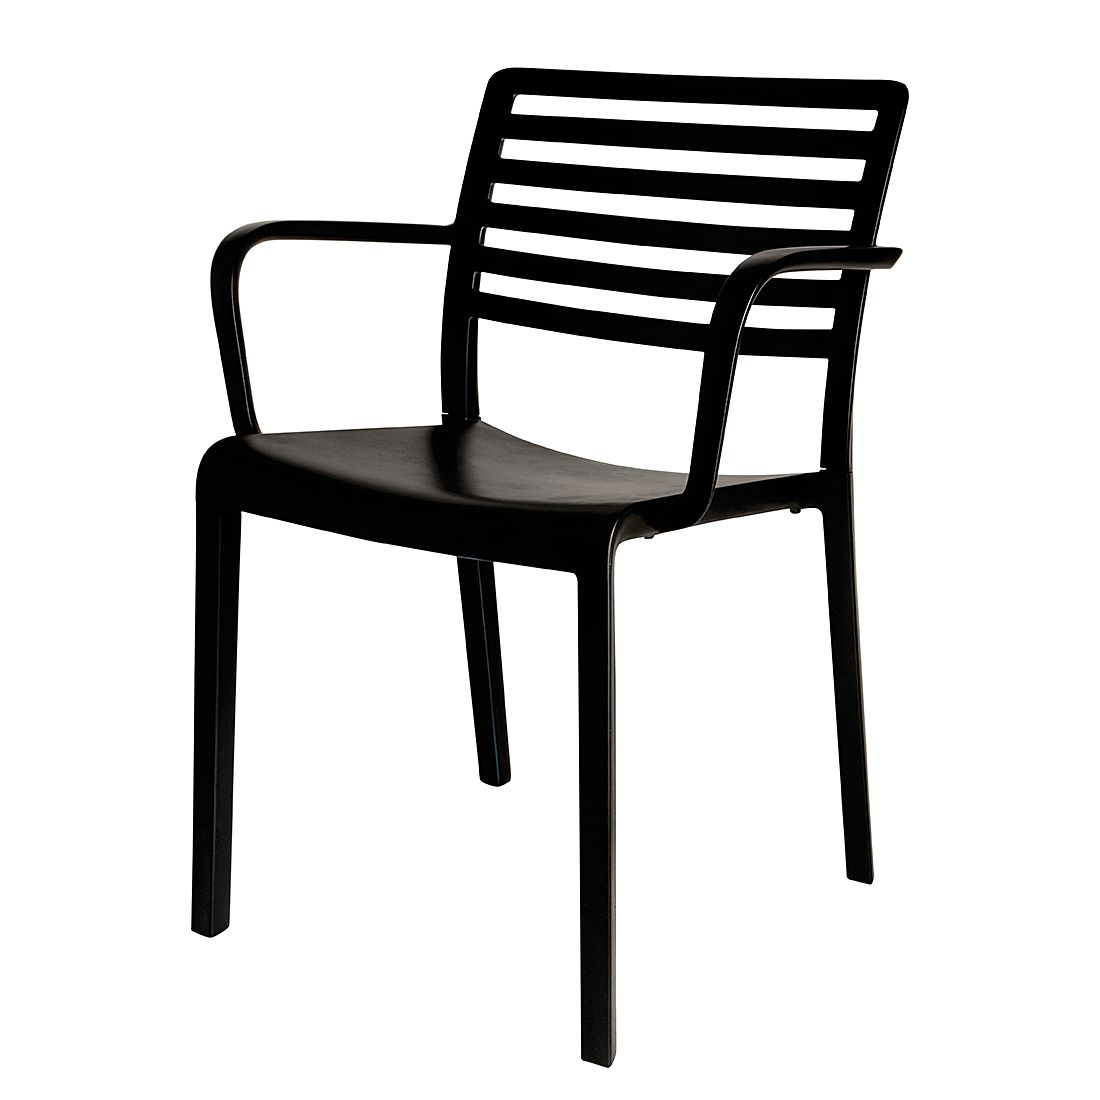 Armlehnenstuhl Lama (2er Set) – Kunststoff – Schwarz, Blanke Design bestellen